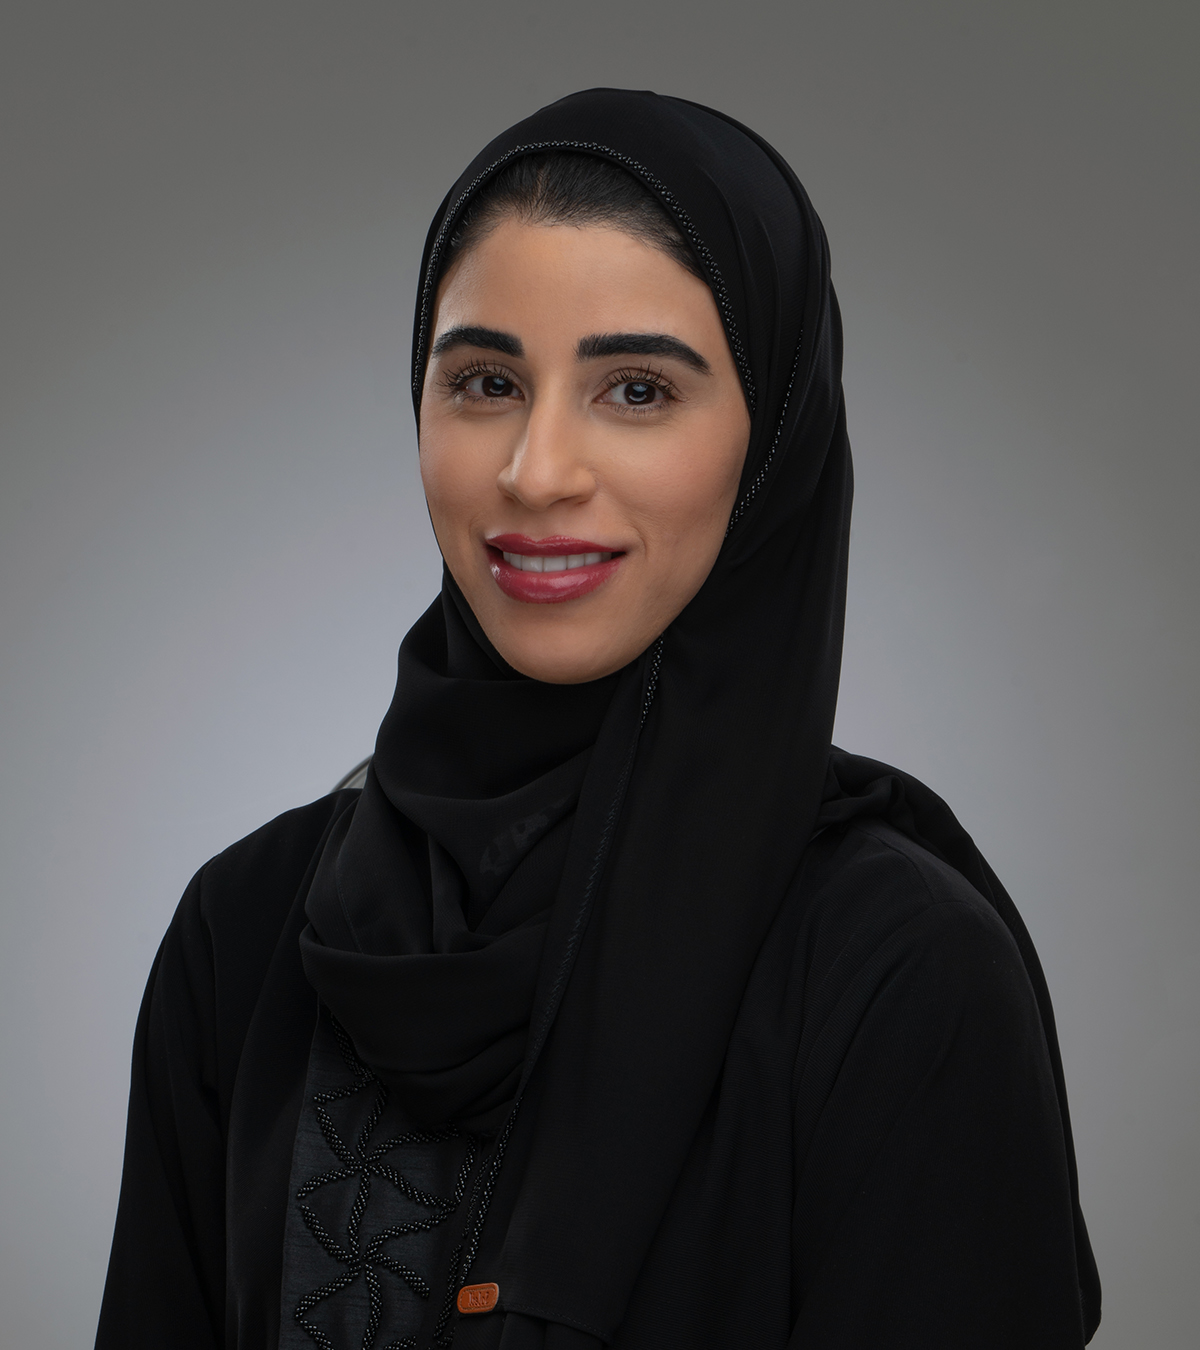 Khadeja Al-Zarraa